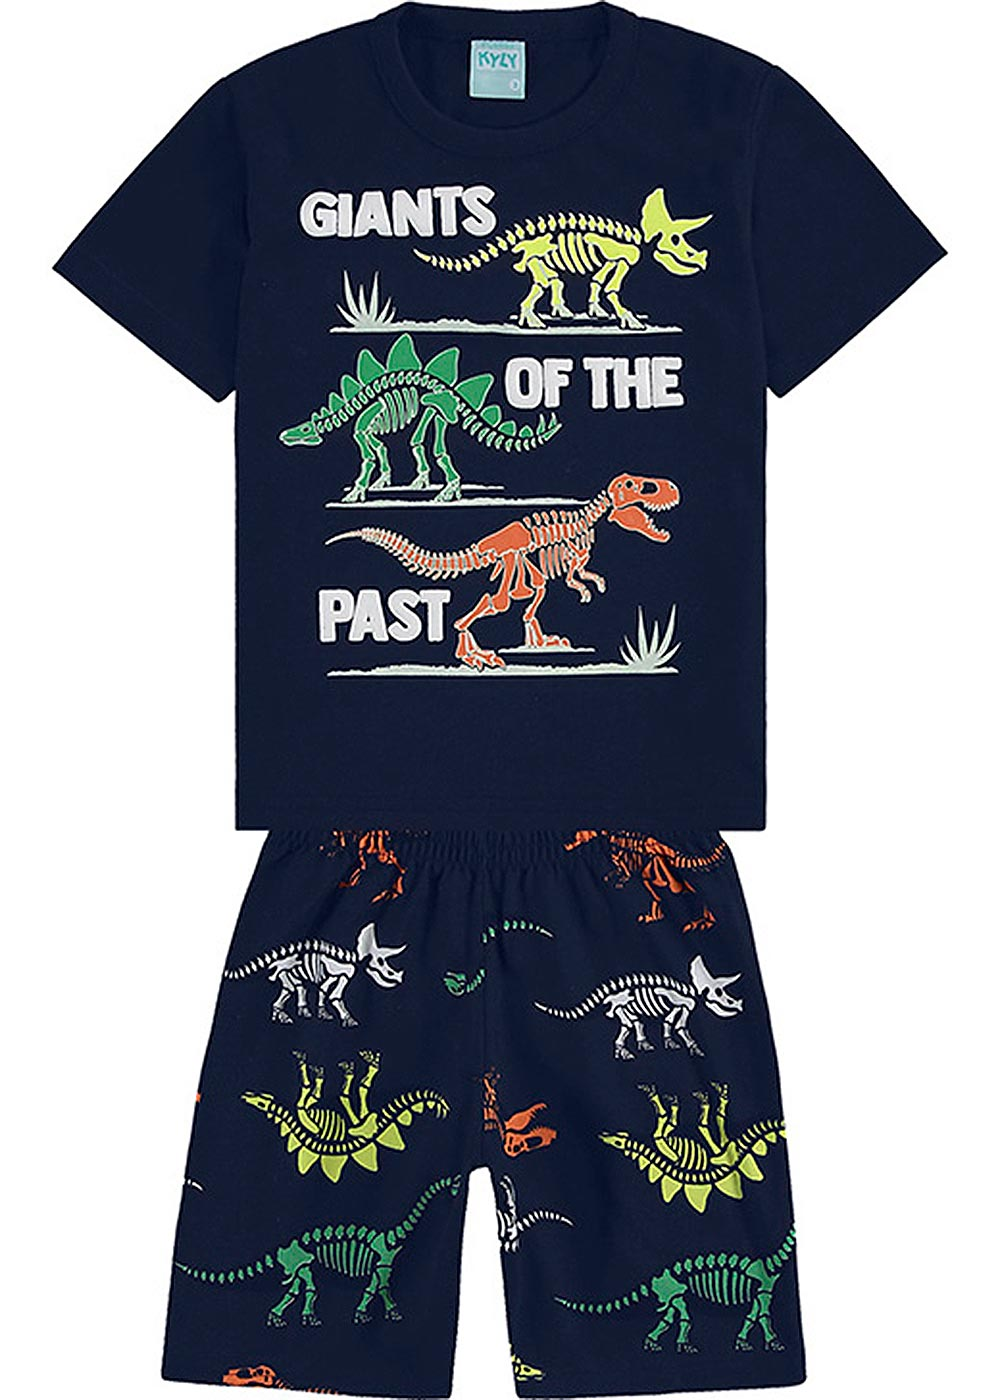 Pijama Infantil Masculino Verão Marinho Giants of Past - Kyly